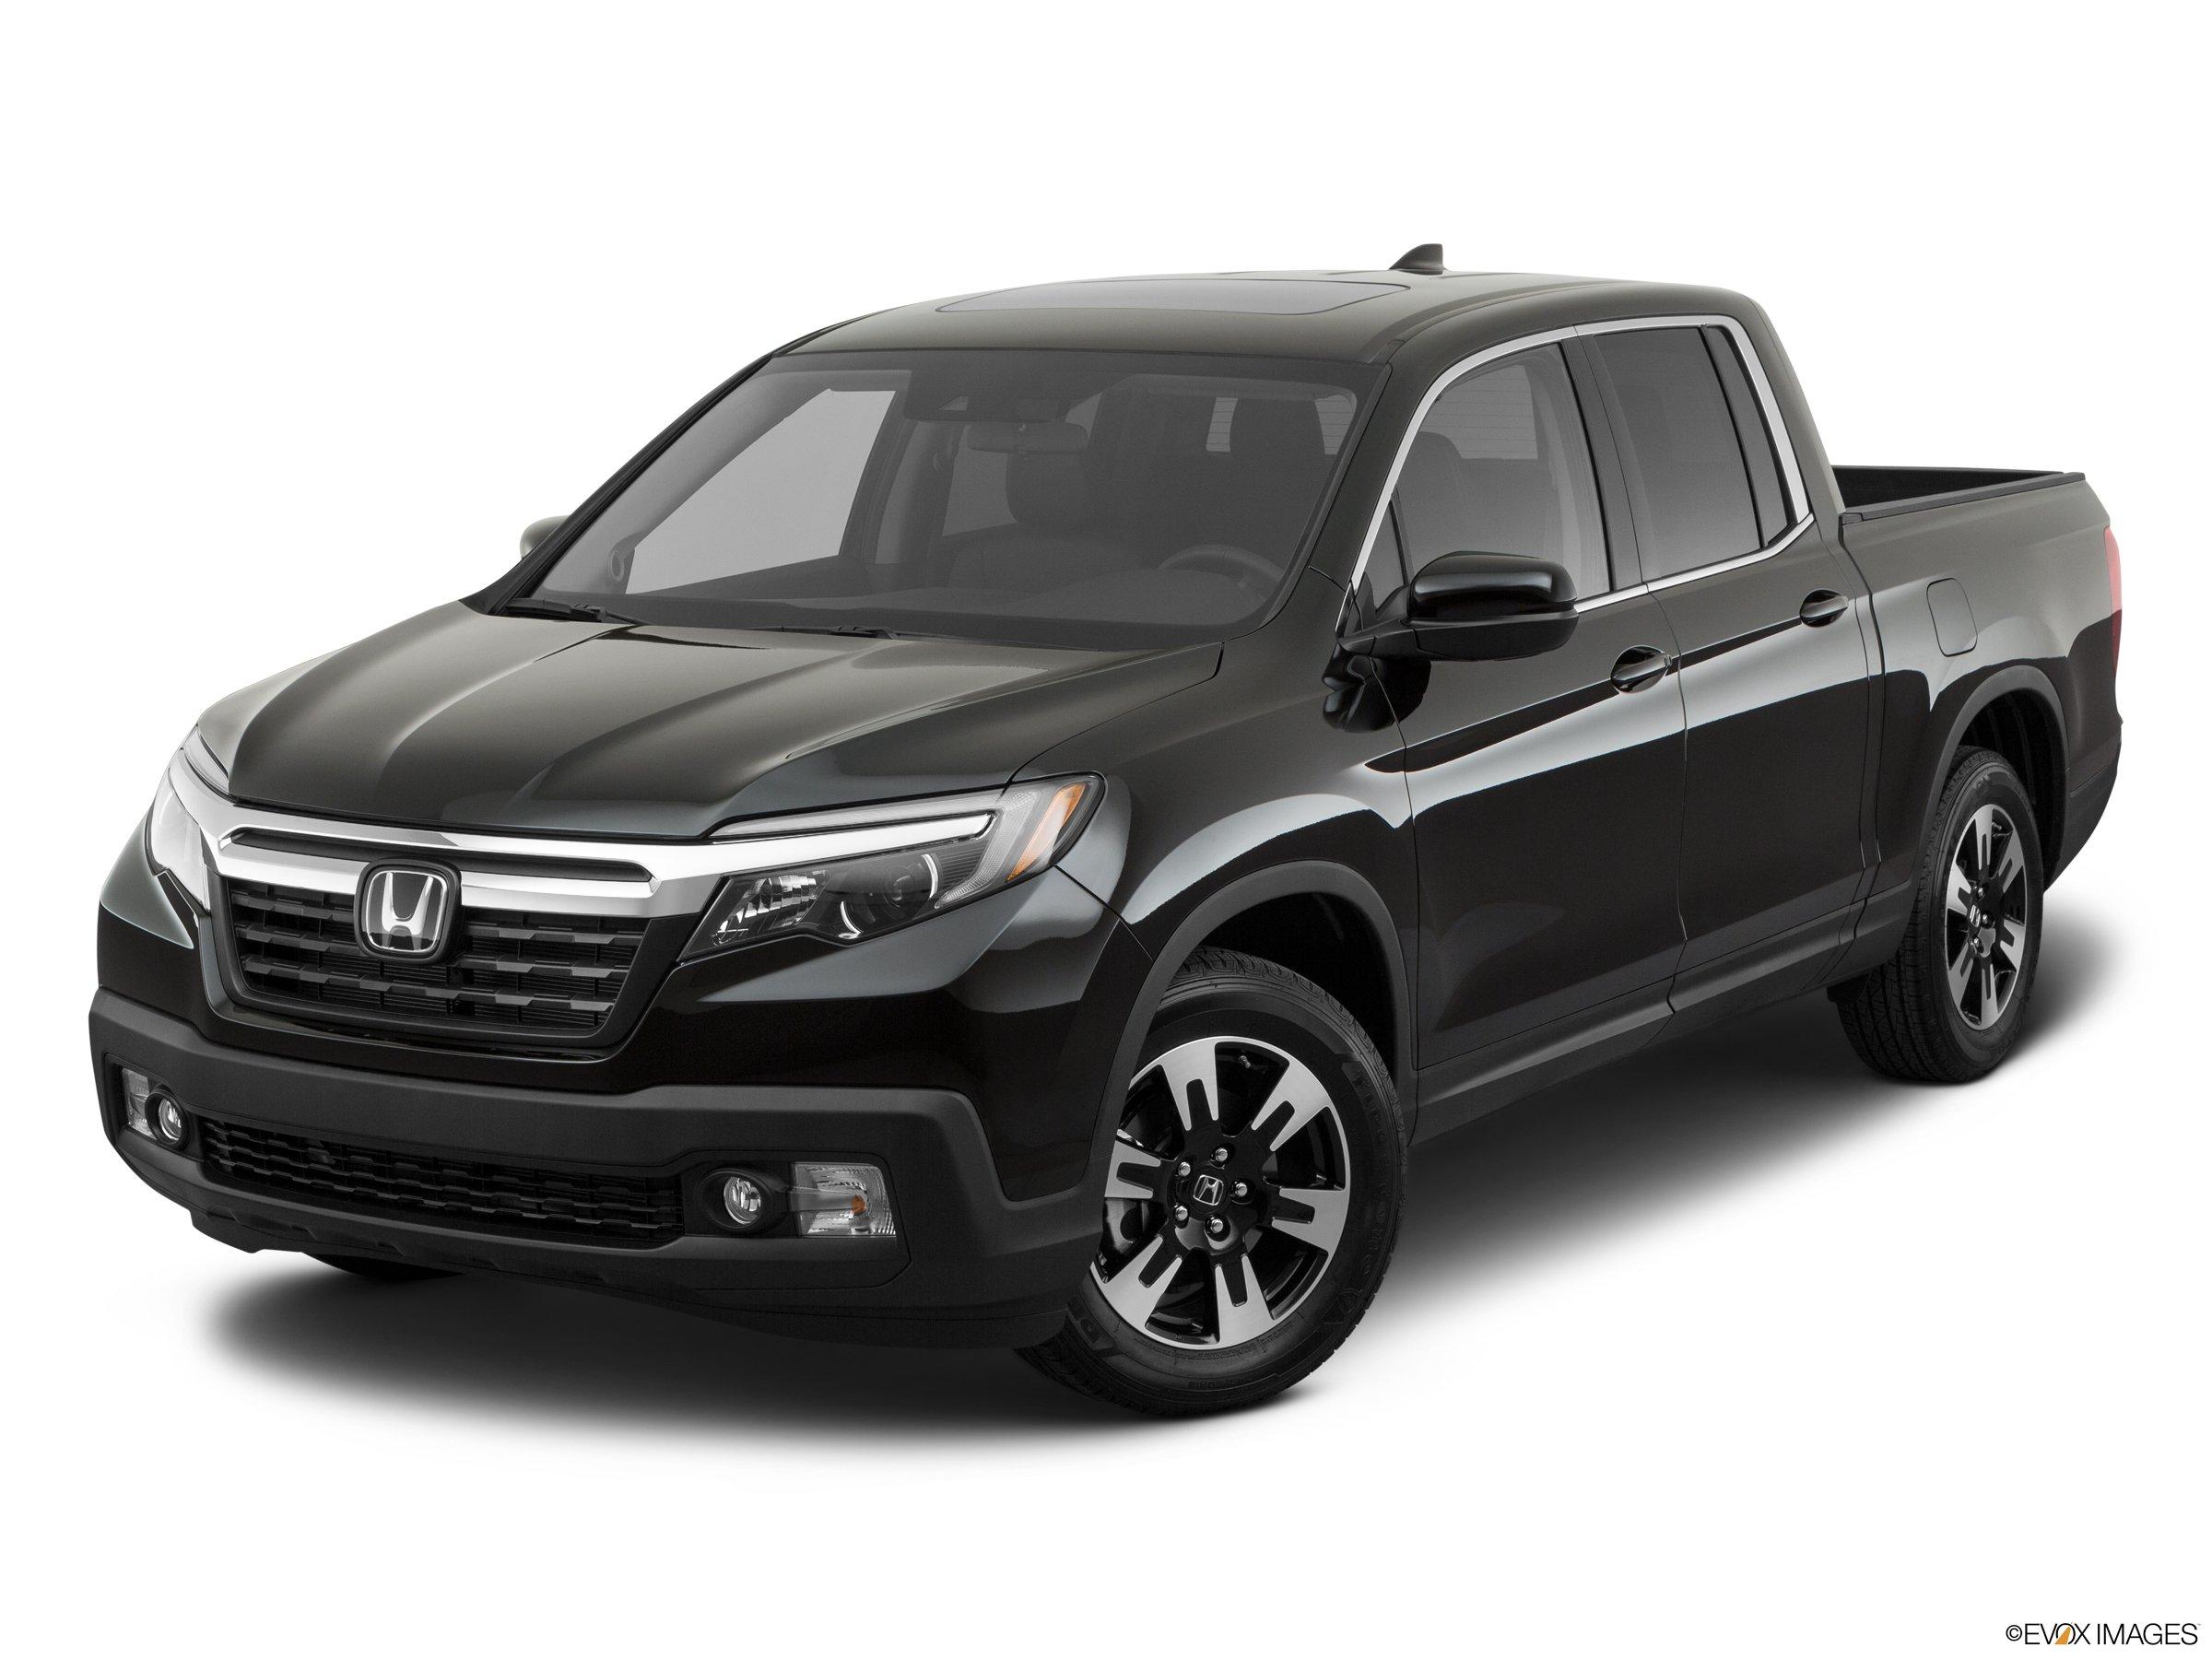 2020 Honda Ridgeline RTL FWD pickup